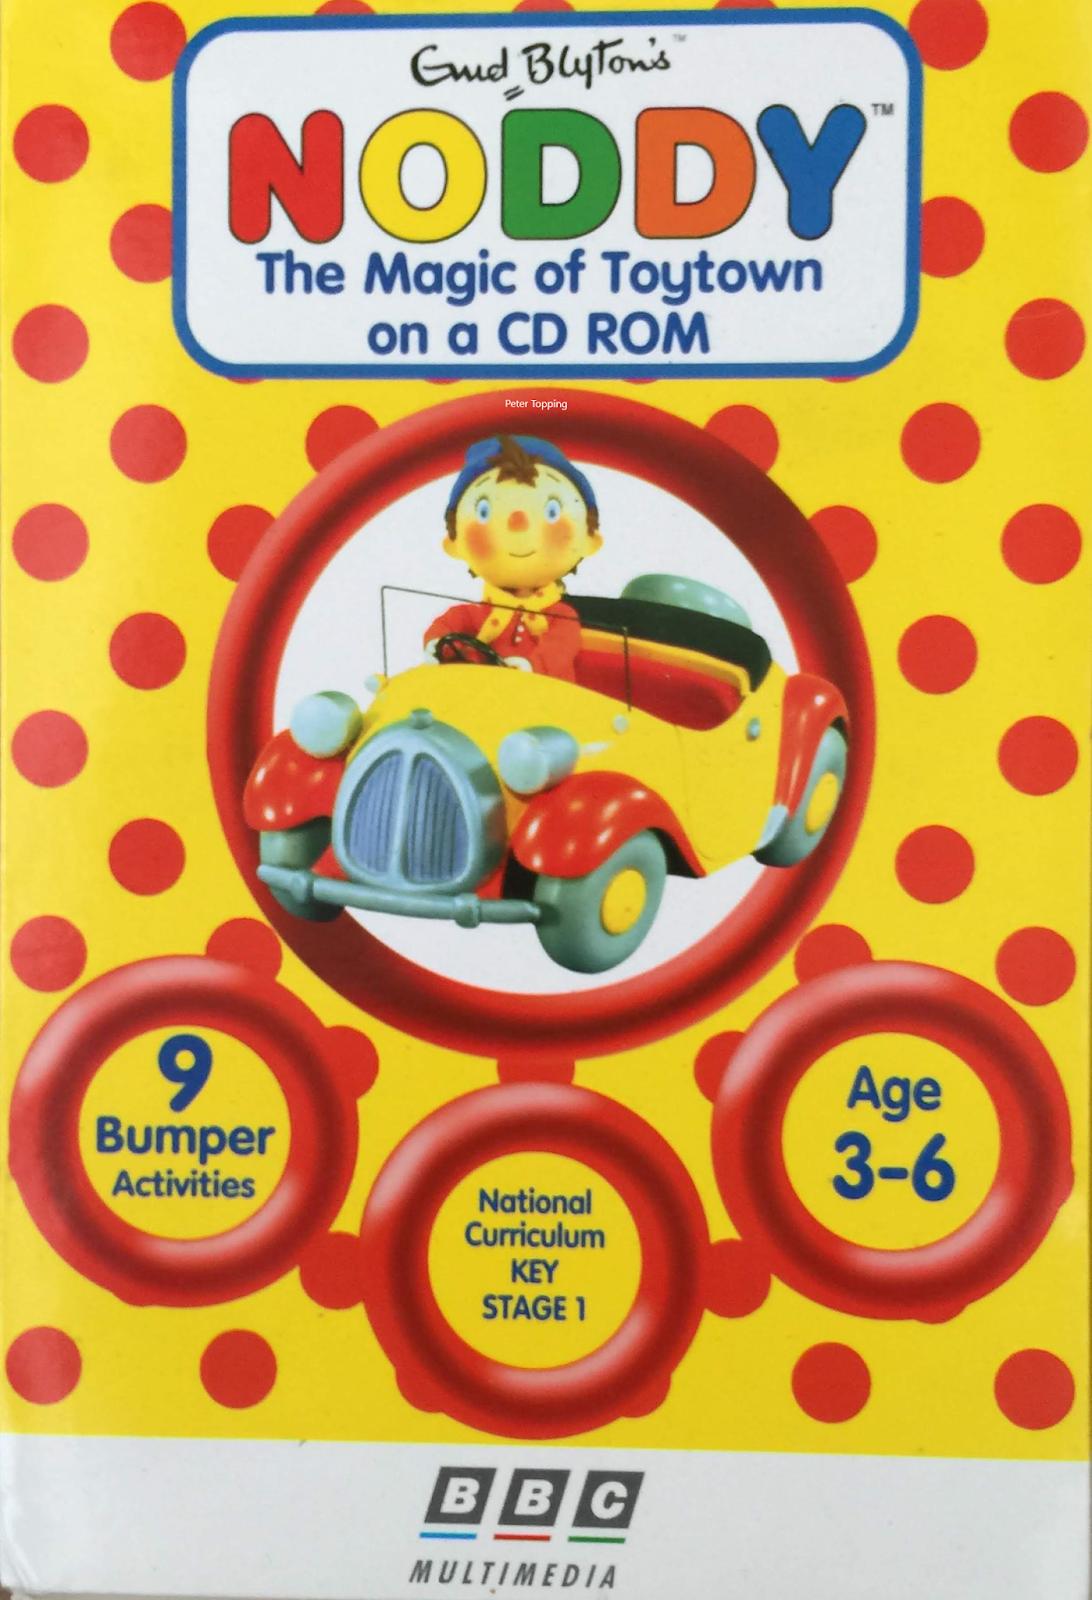 Noddy: The Magic of Toytown